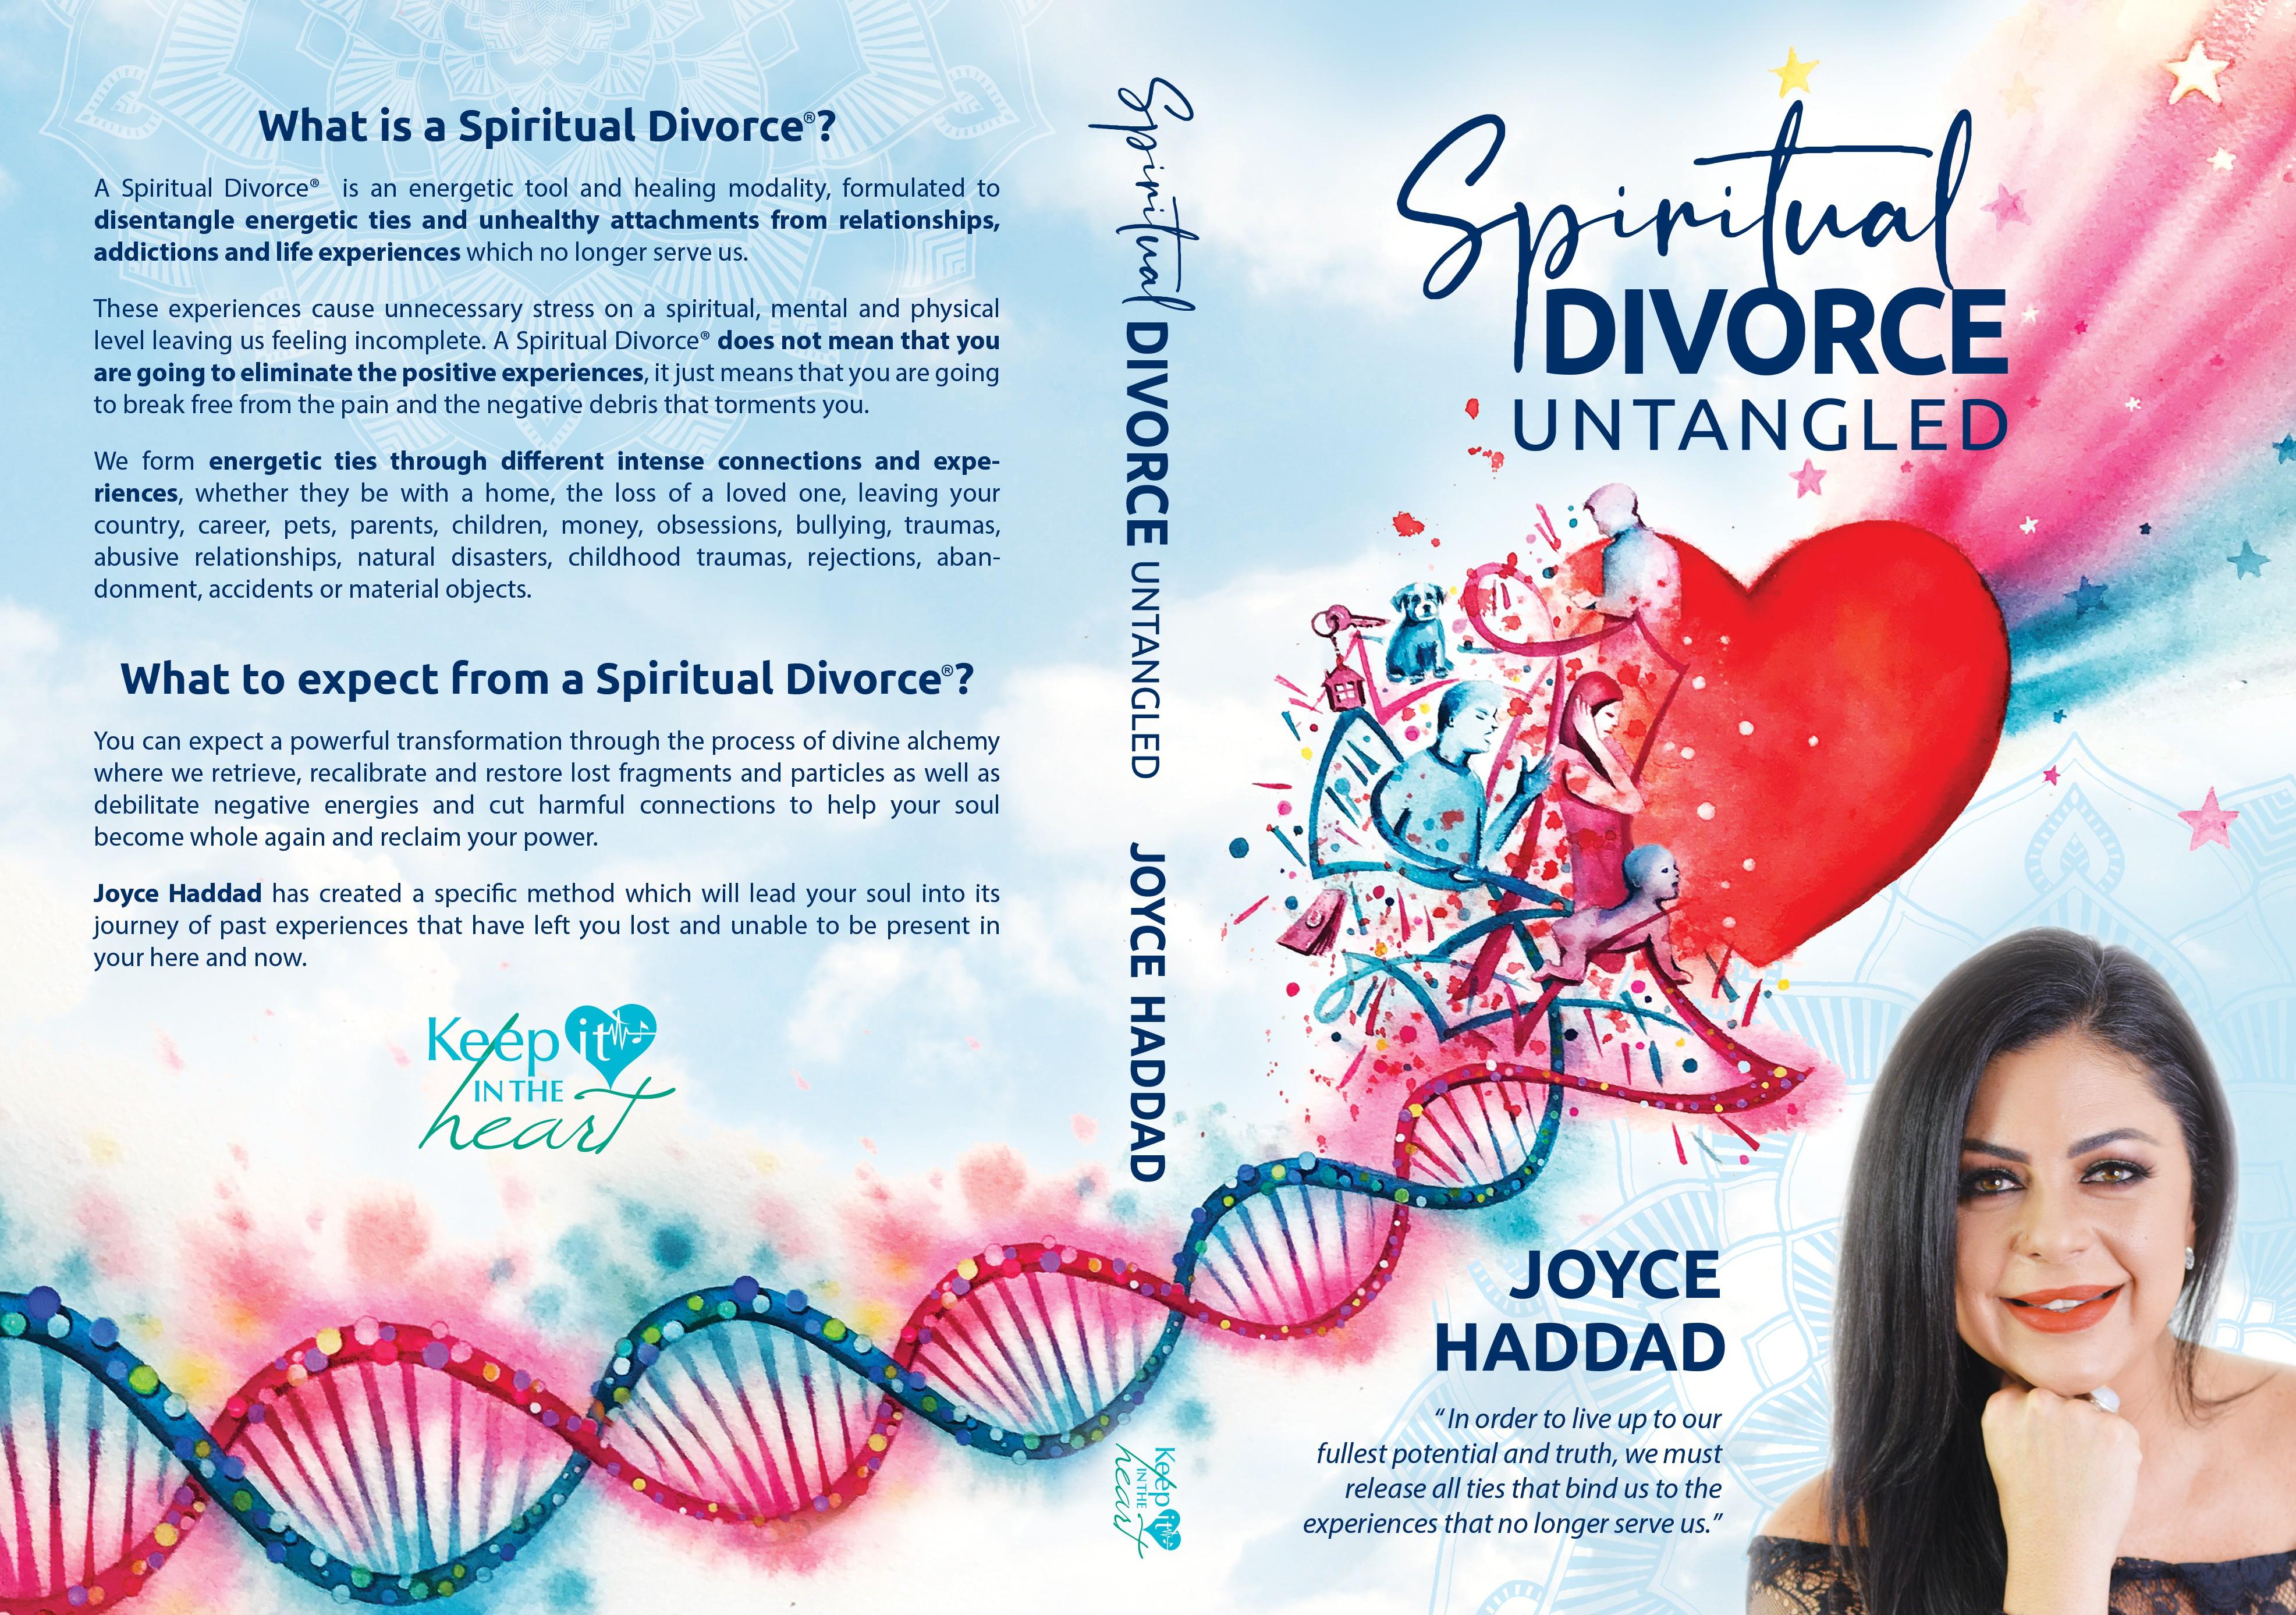 Spirtual Divorce ®  UNTANGLED